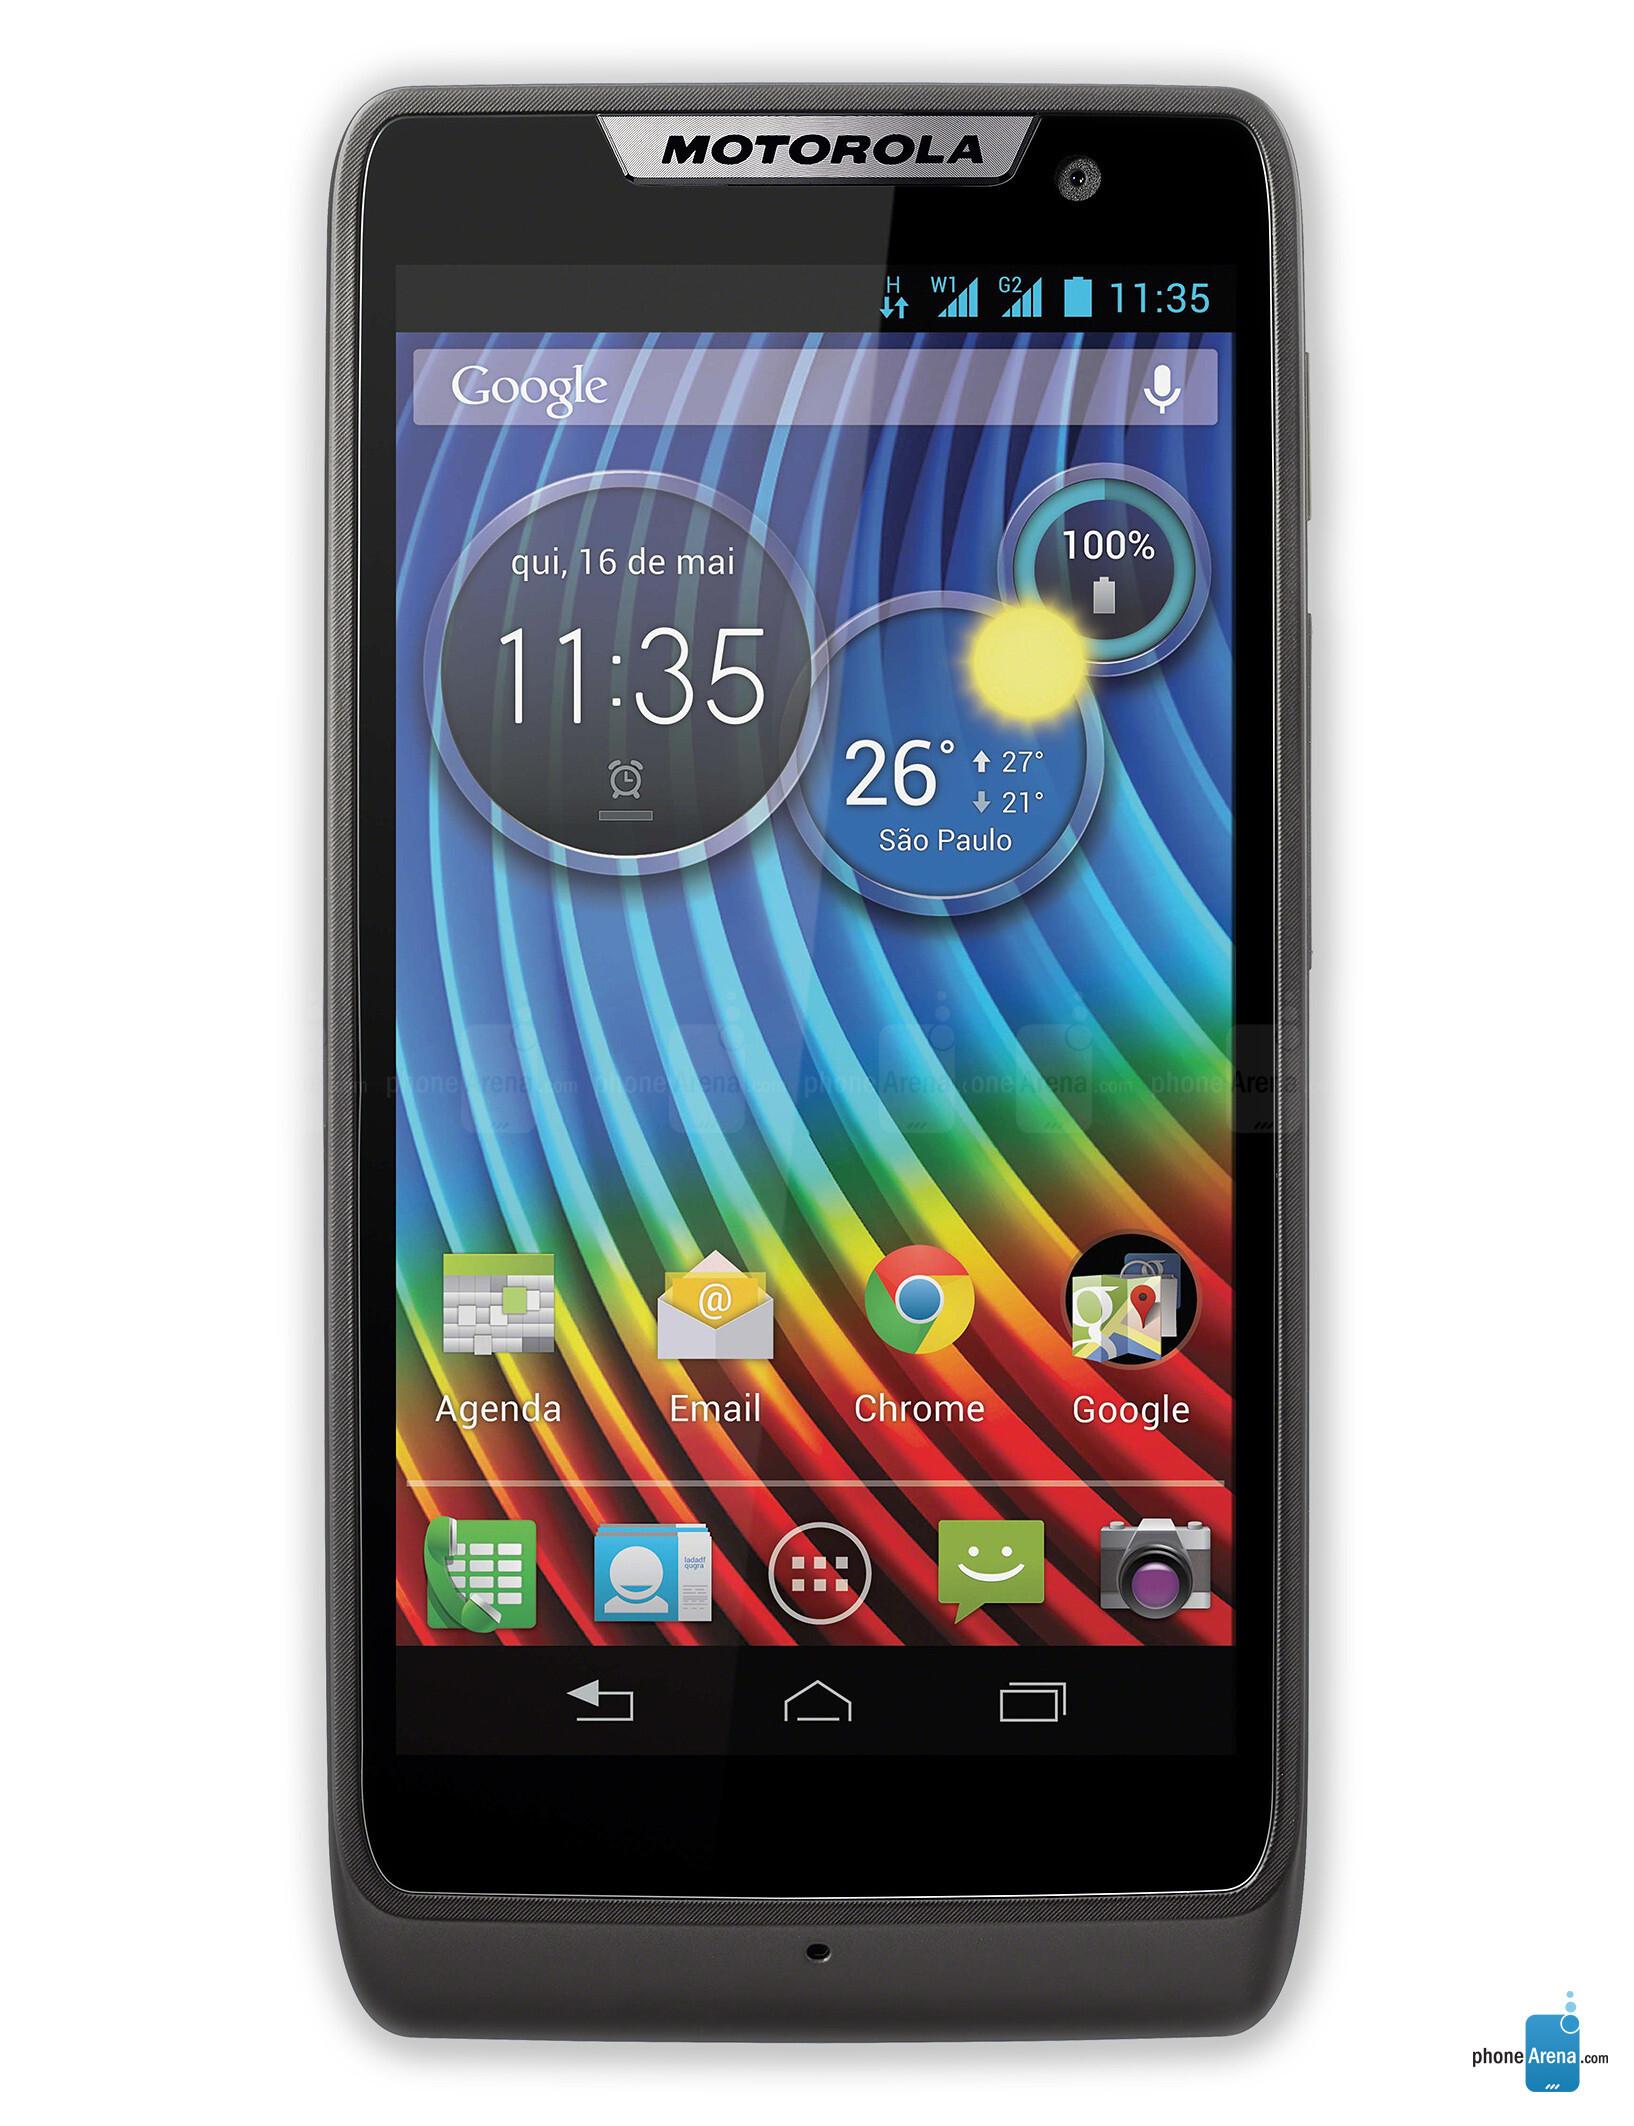 Motorola RAZR D3 specs